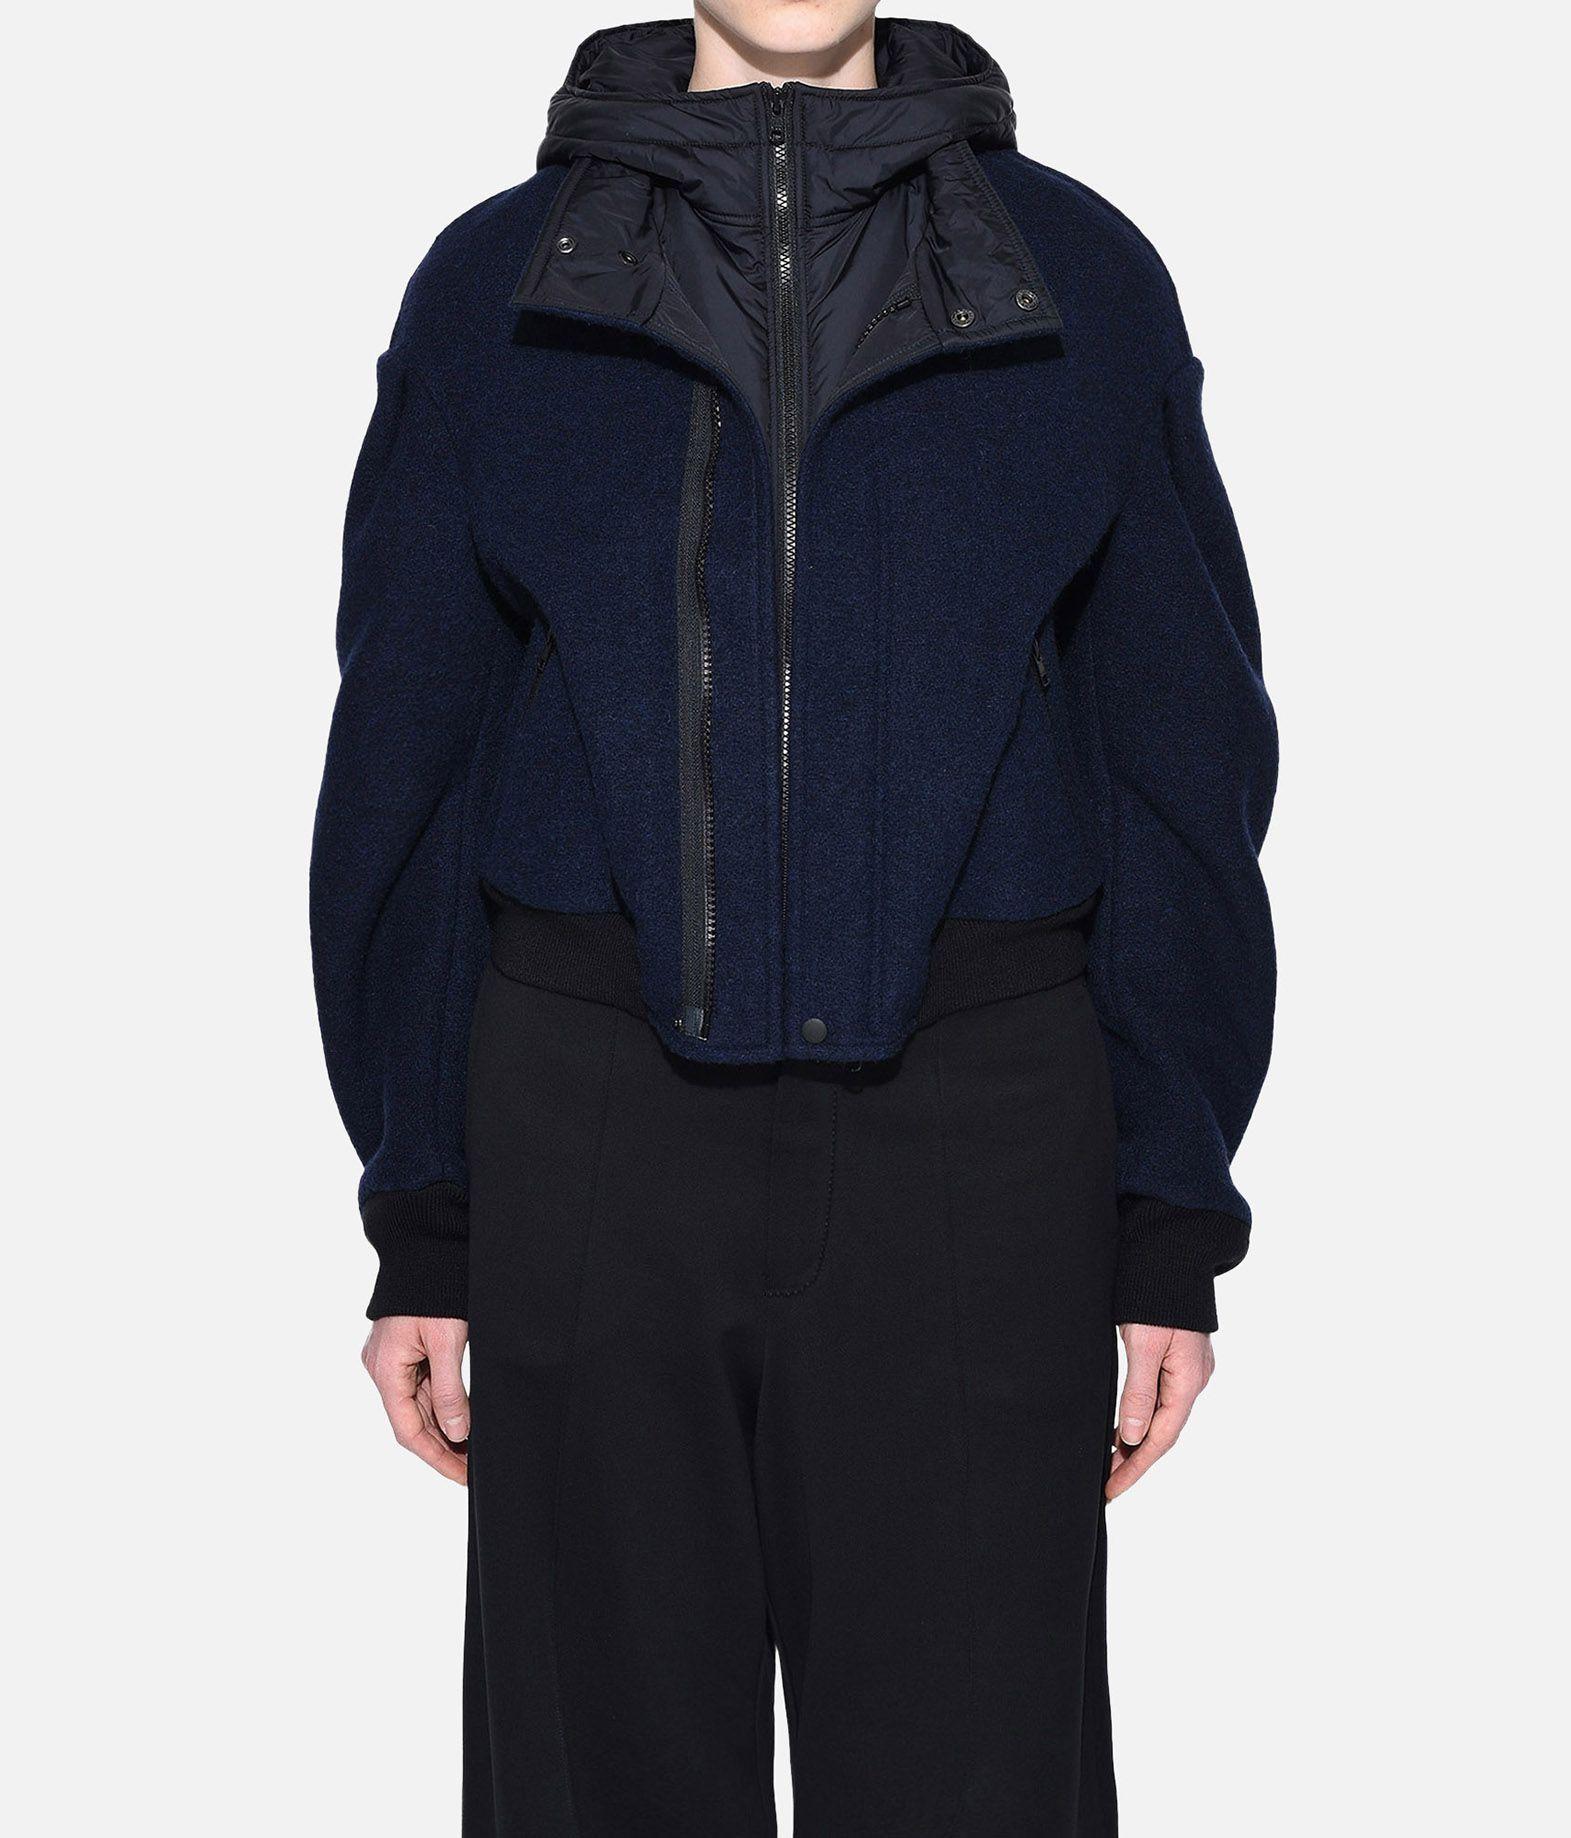 Y-3 Y-3 Wool Hoodie Jacket Giubbotto Donna r